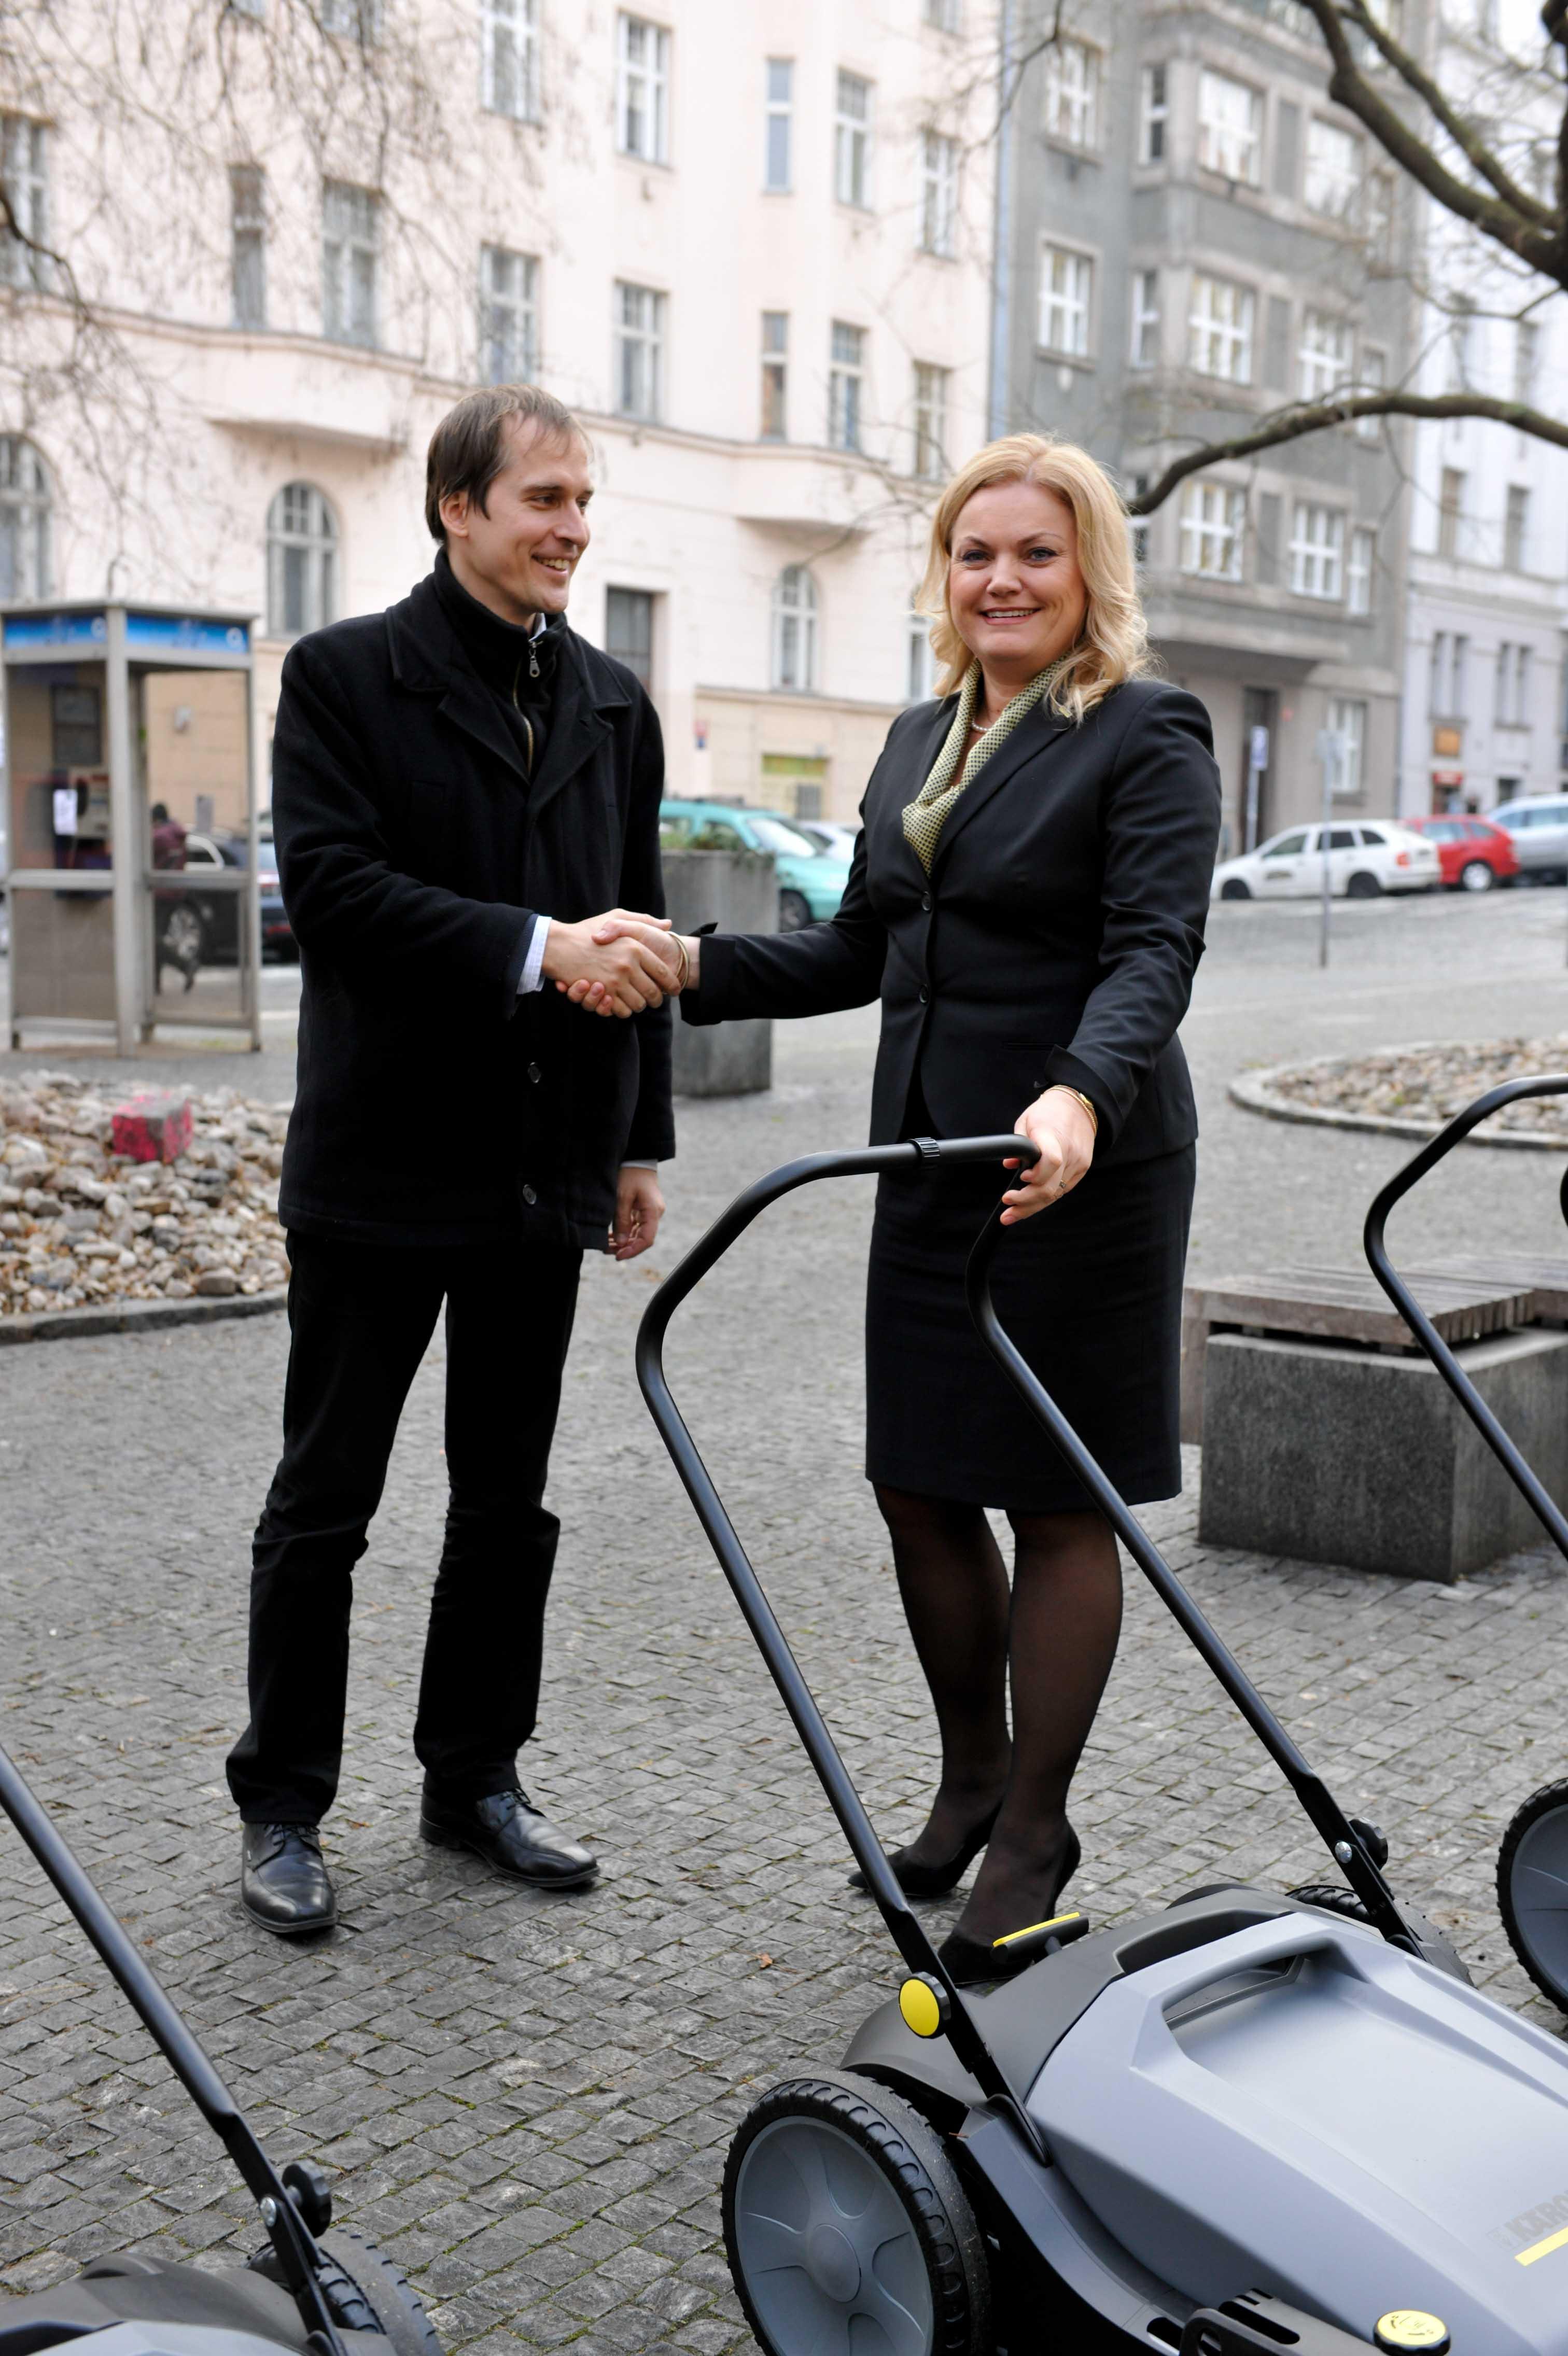 Predani Karcher_Praha 7 starosta Cizinsky_Karcher pani Skutilova_outdoor_zoom